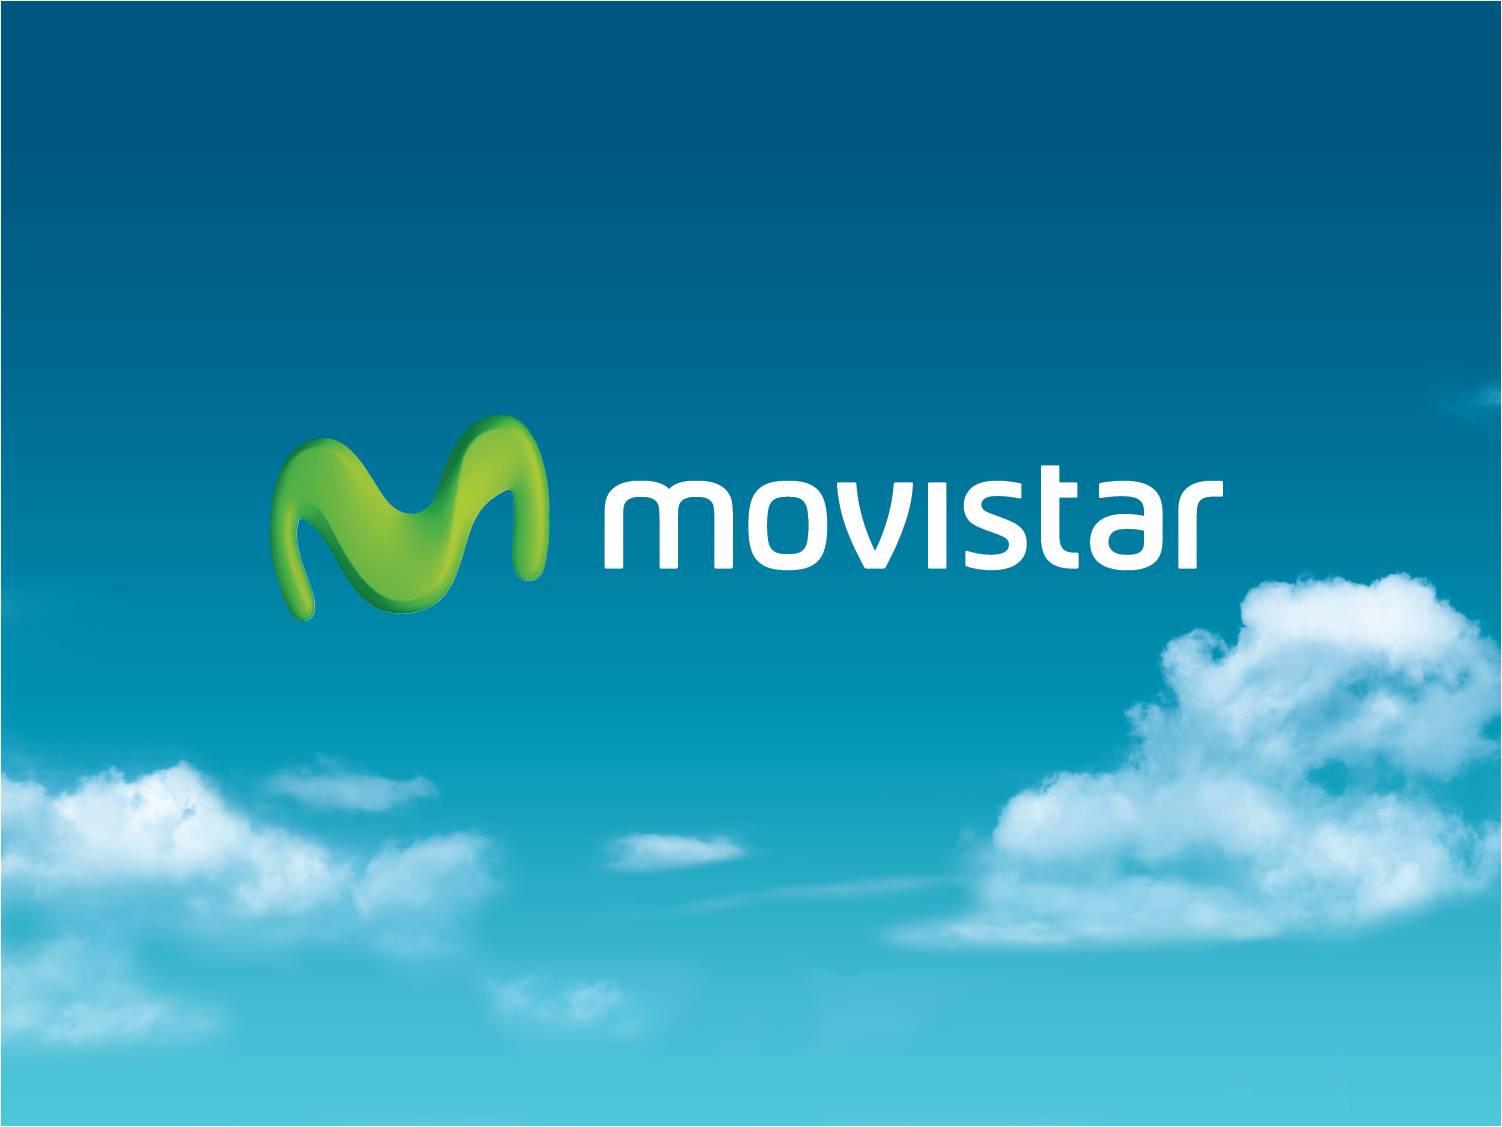 Movistar marca valiosa